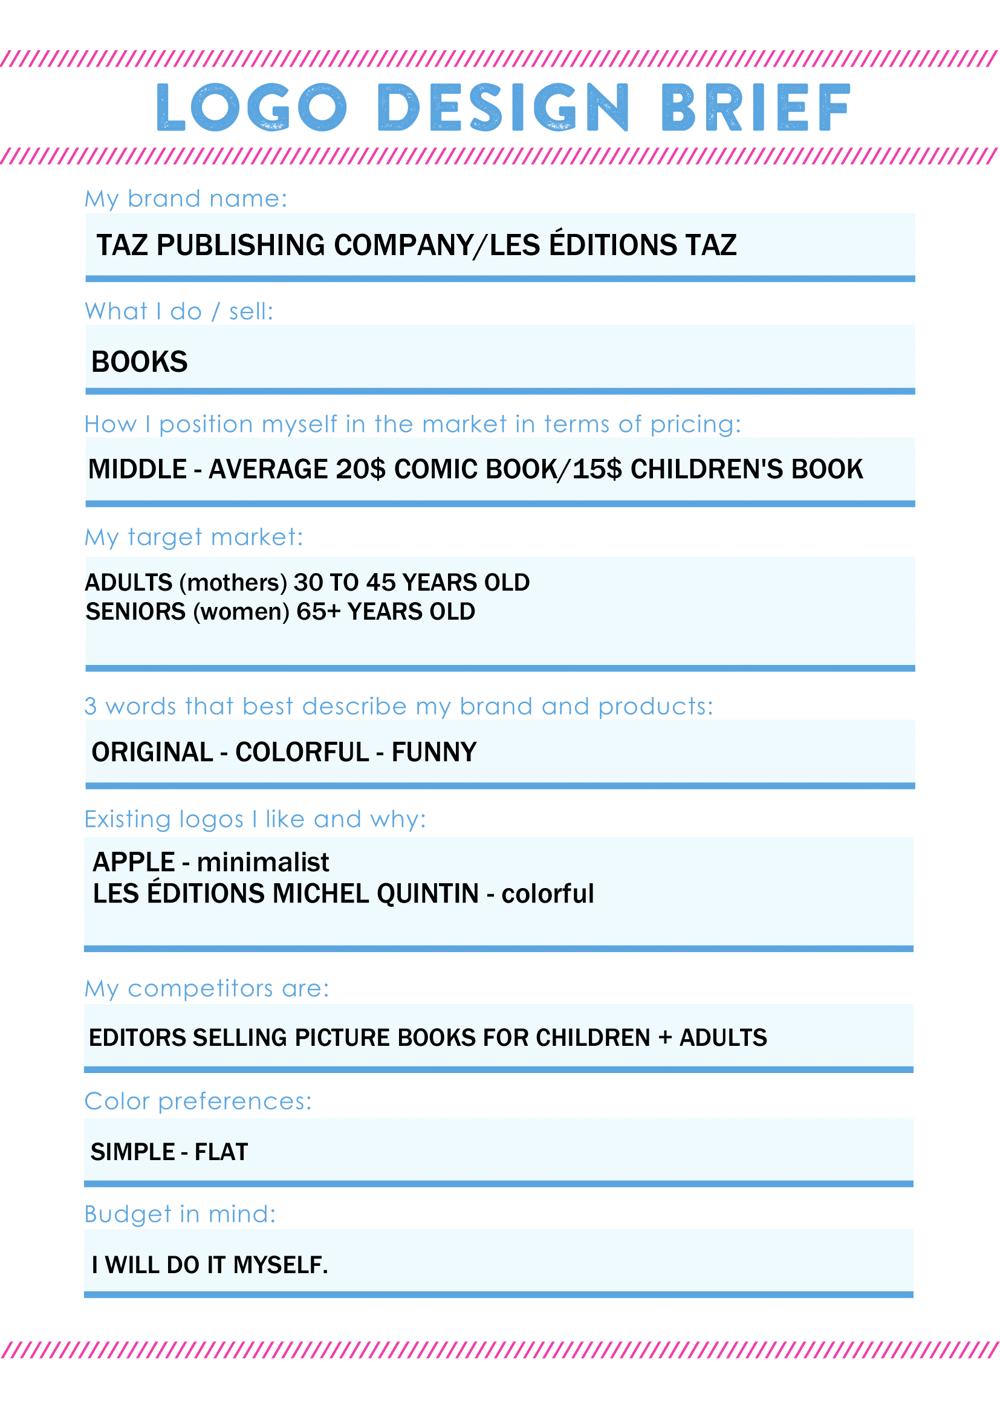 Taz Publishing Co. - image 6 - student project